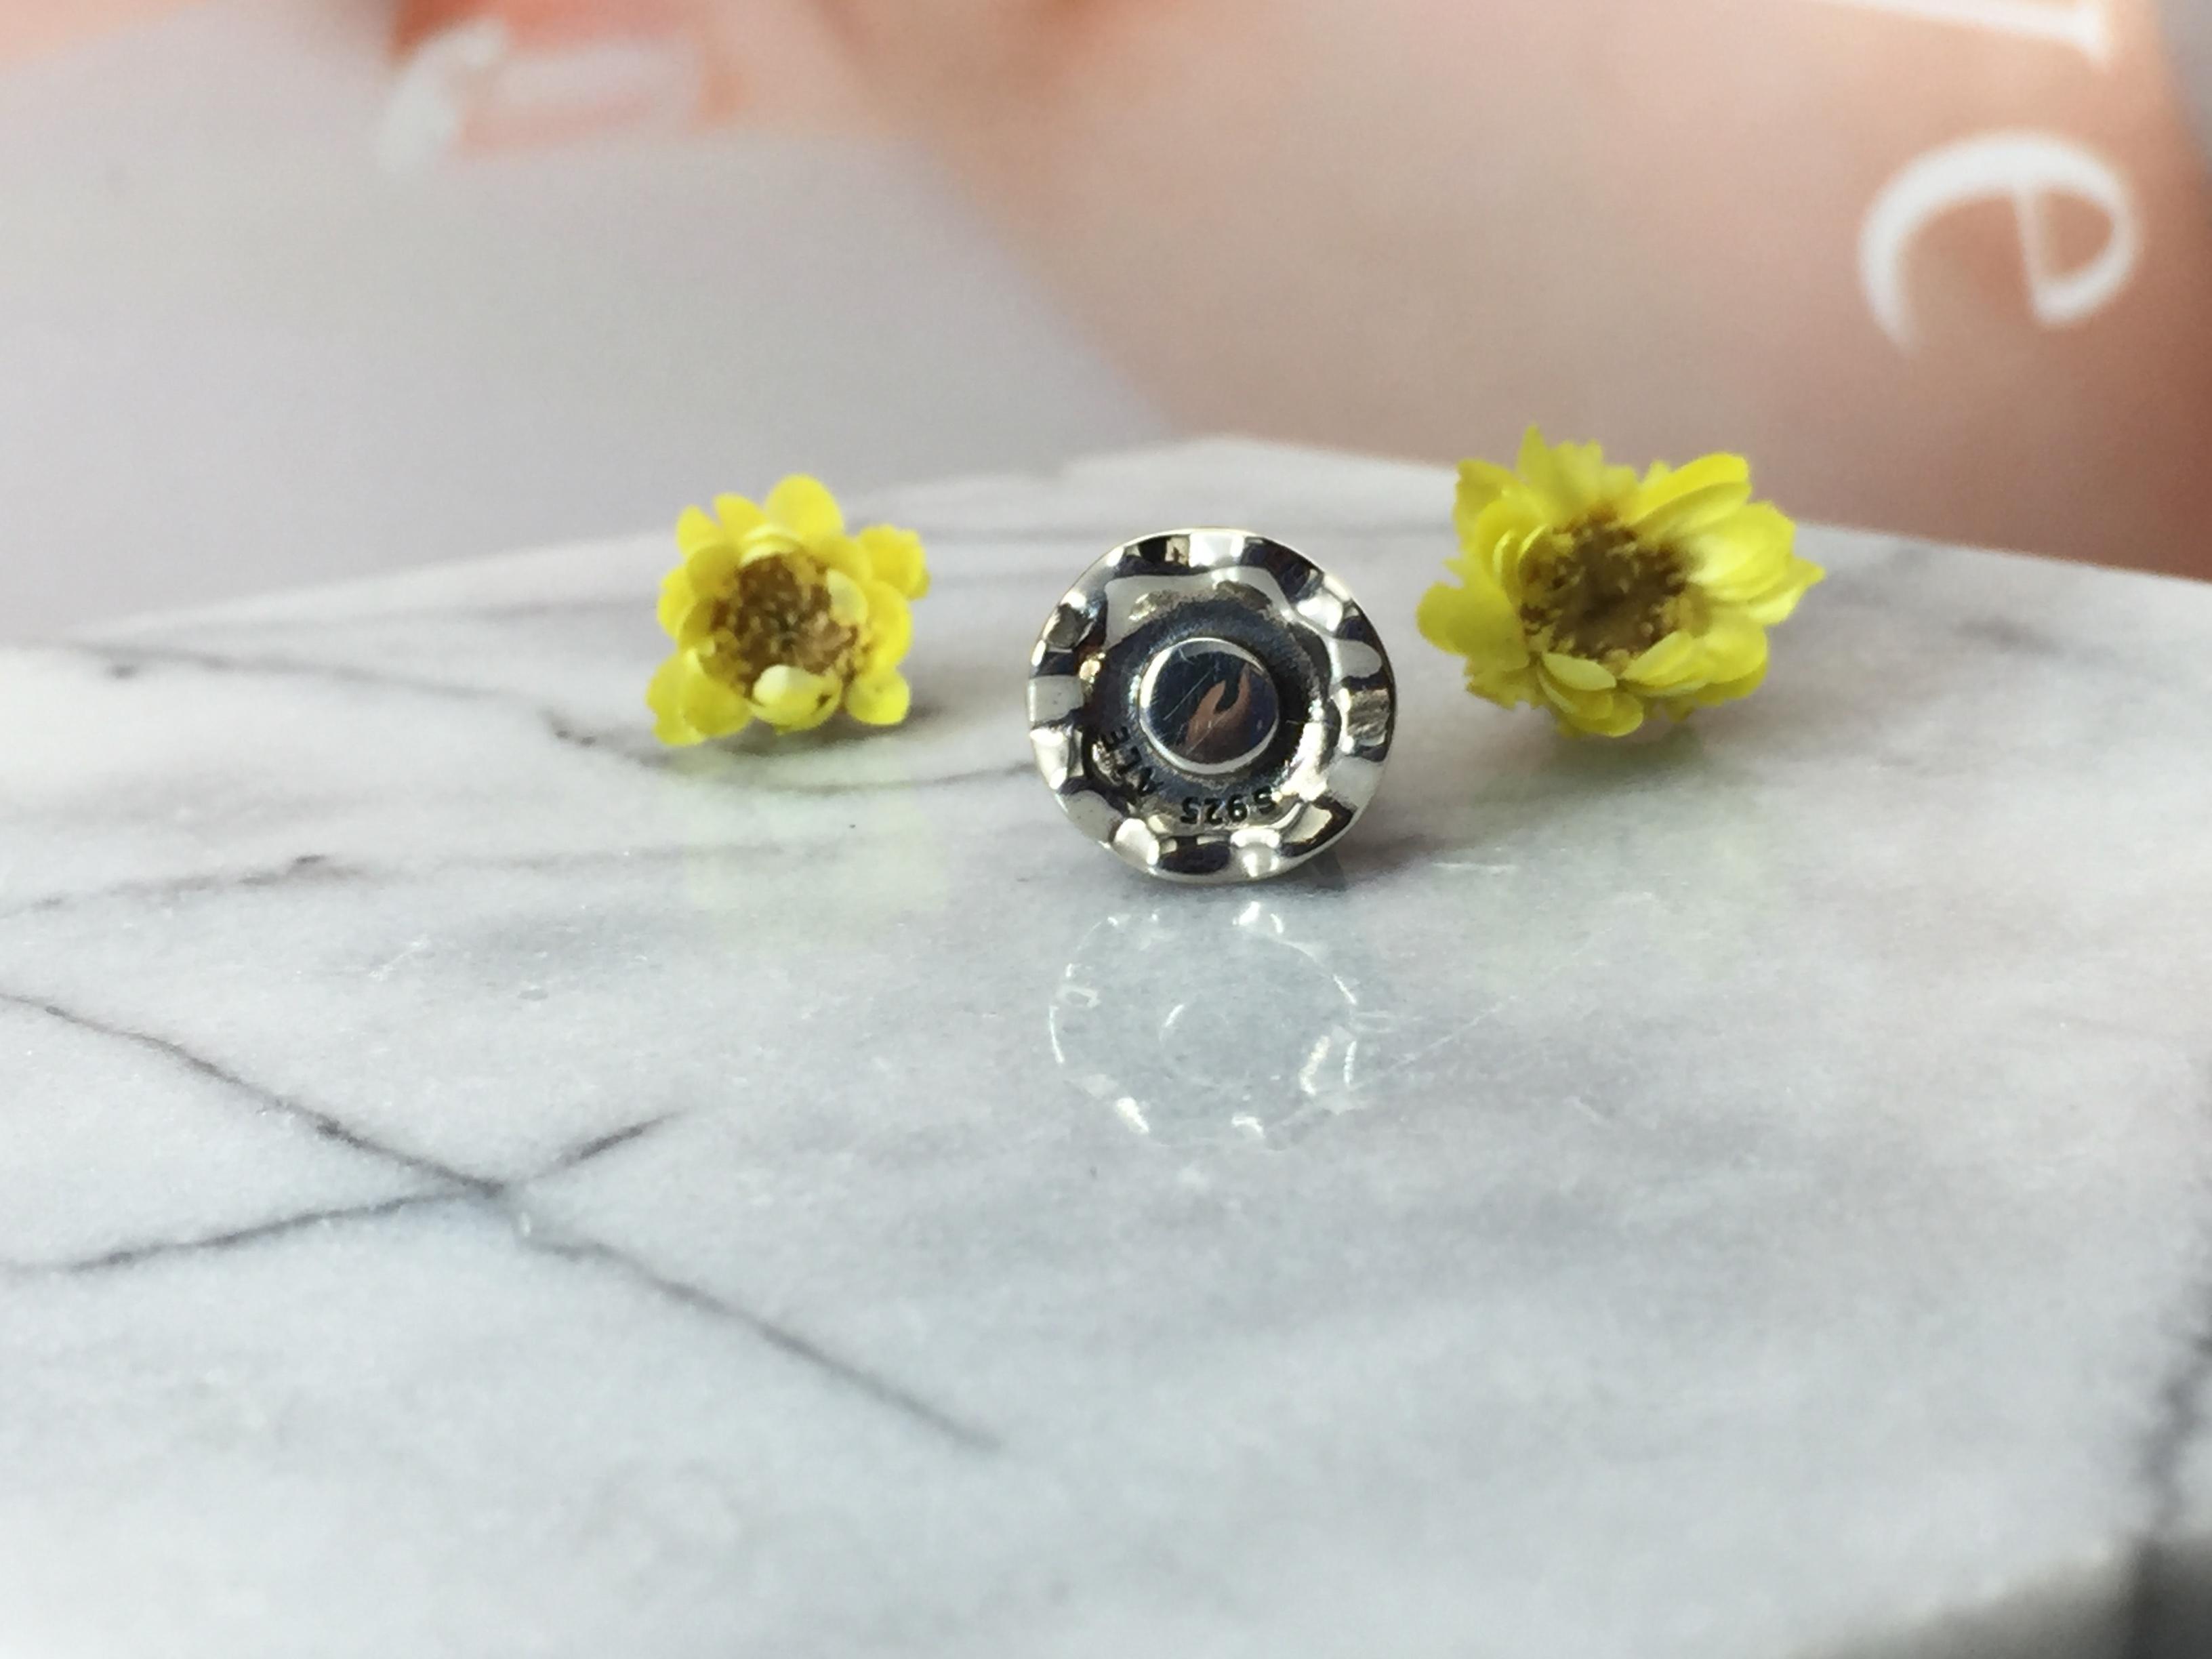 FAHMI 100% 925 Sterling Silver 1:1 Authentic 791765CZ Twinkling Christmas Tree Charm  Bracelet Original  Women  Jewelry 3